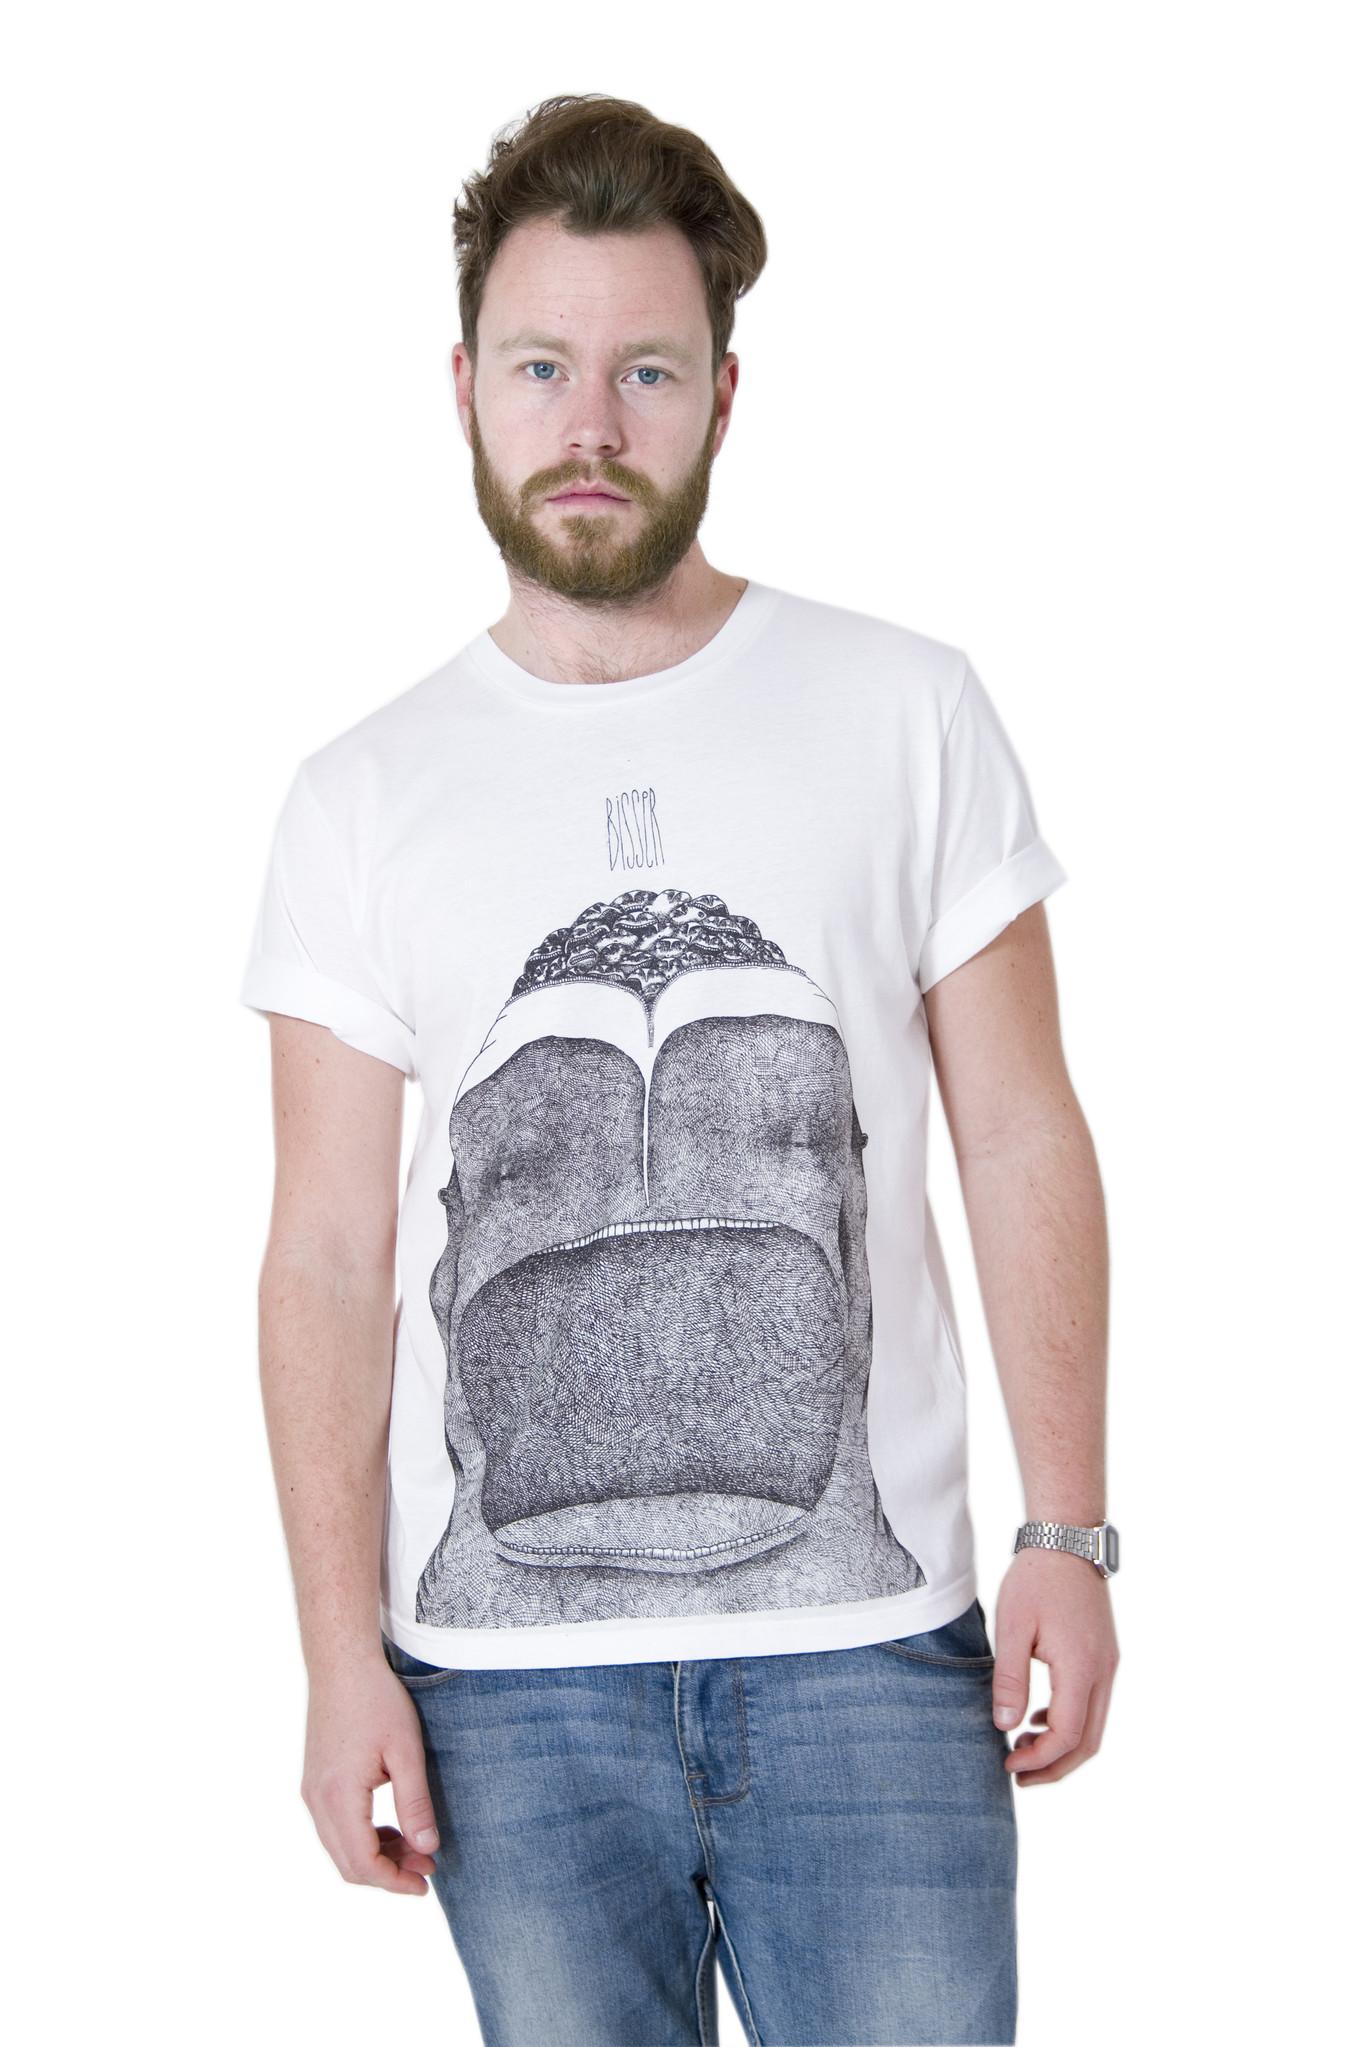 Bisser Loenatix T-shirt